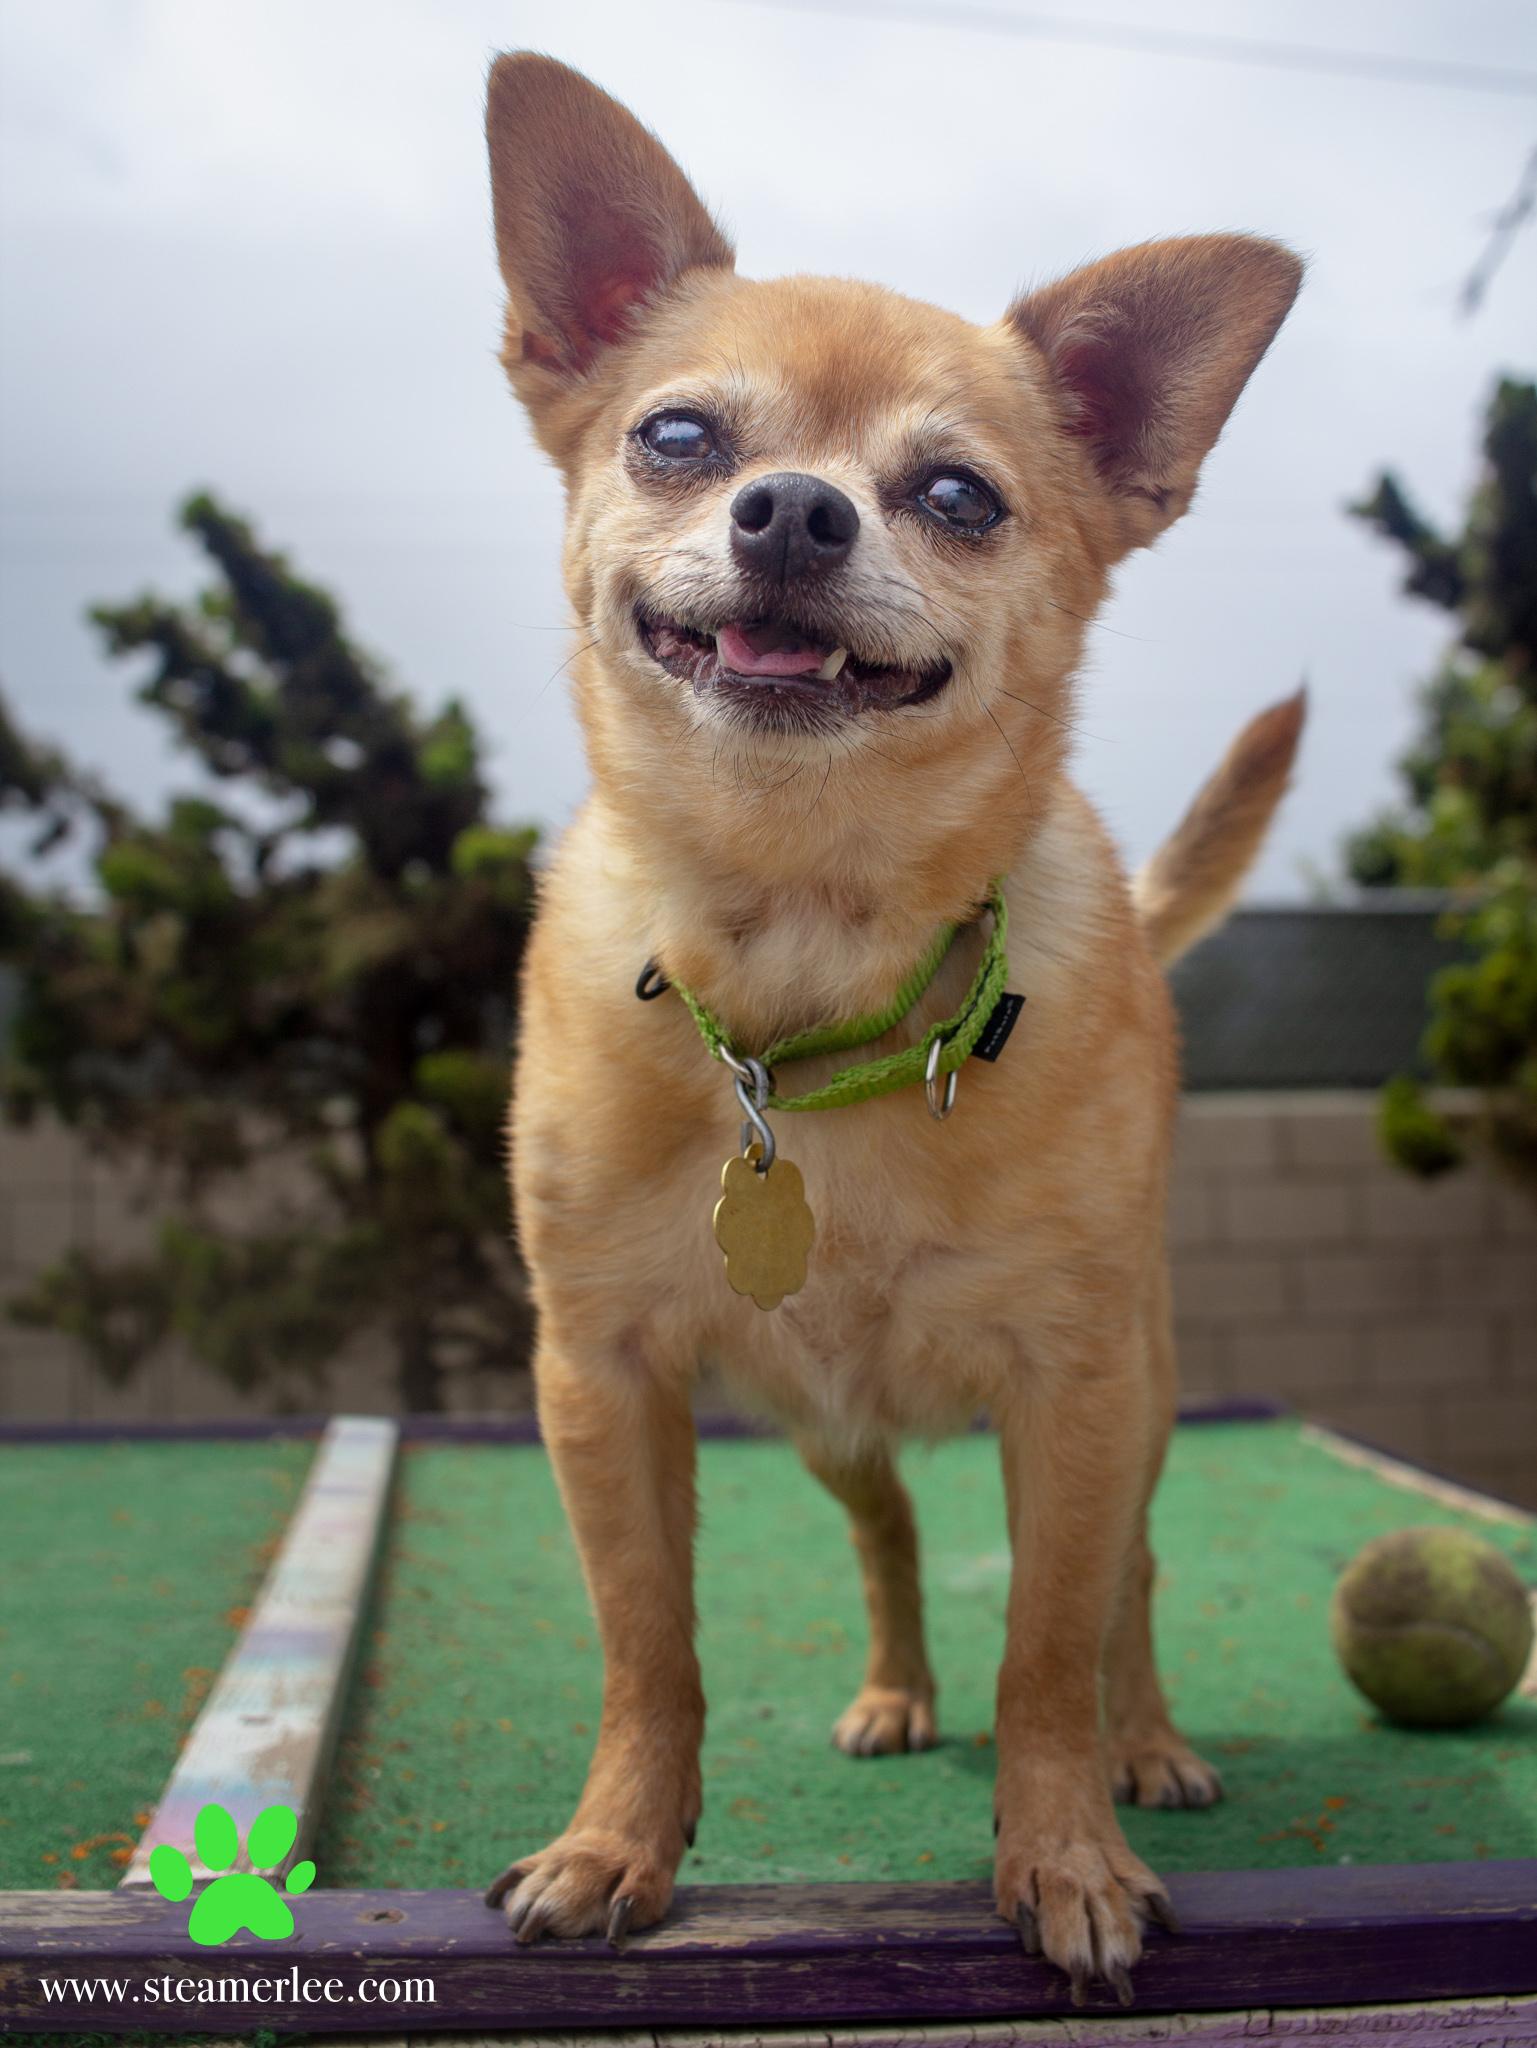 374-Orange-County-Dog-Photography-Steamer-Lee-Southern-California-SBACC.JPG